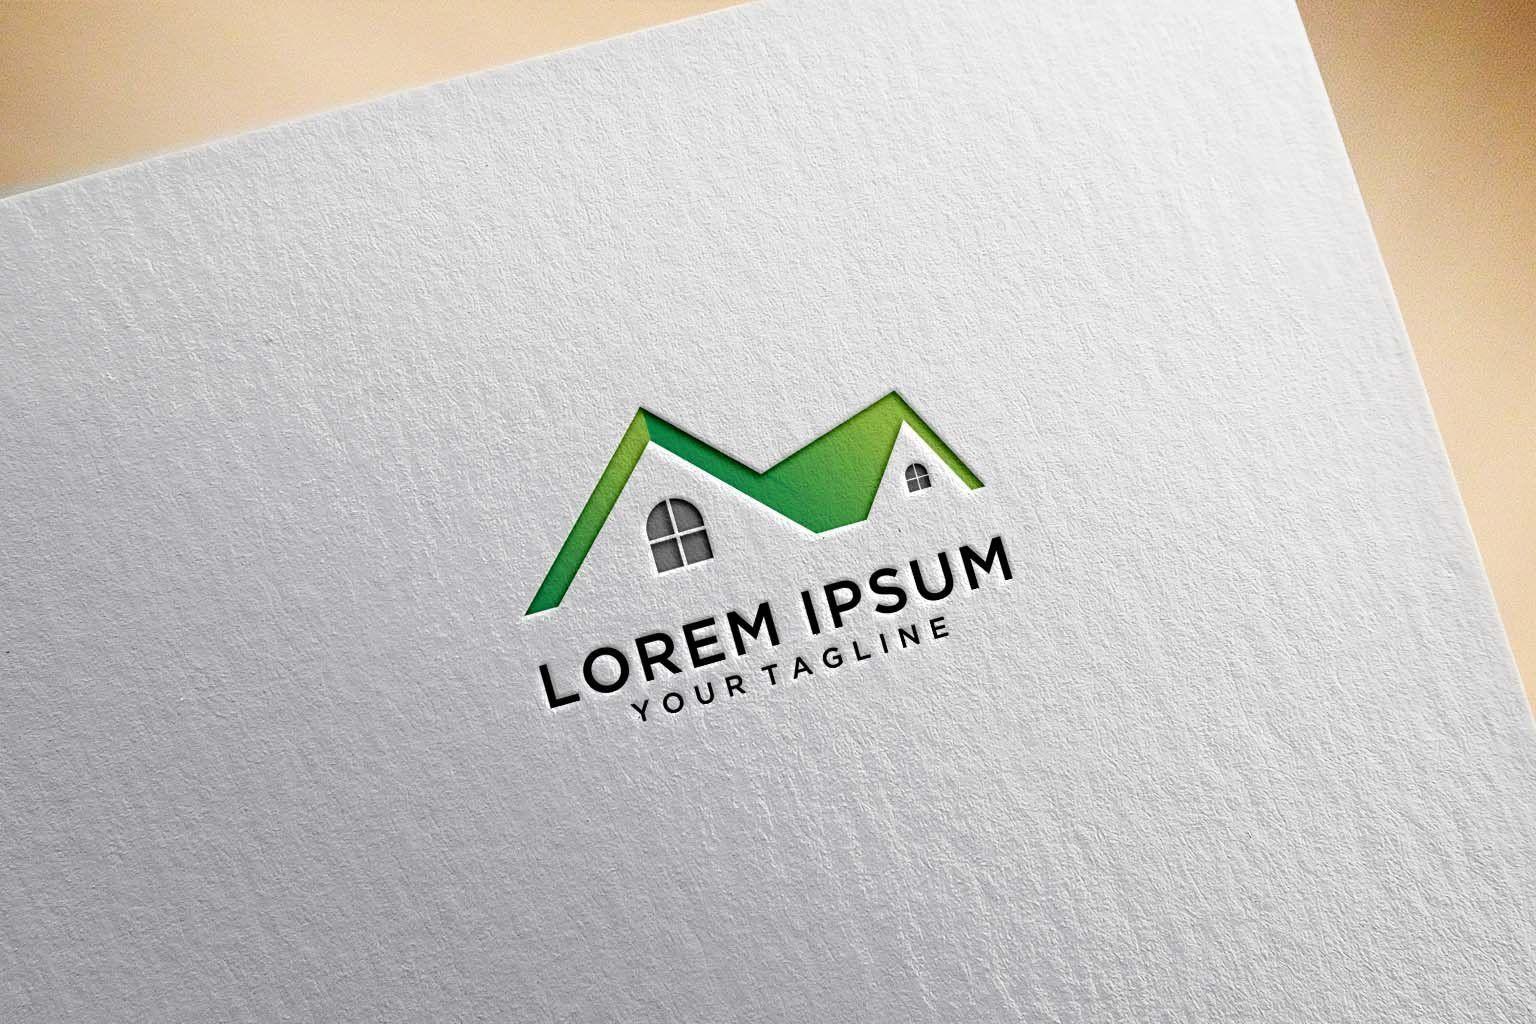 Home Logo Startup Logo Design Home Logo Startup Logo